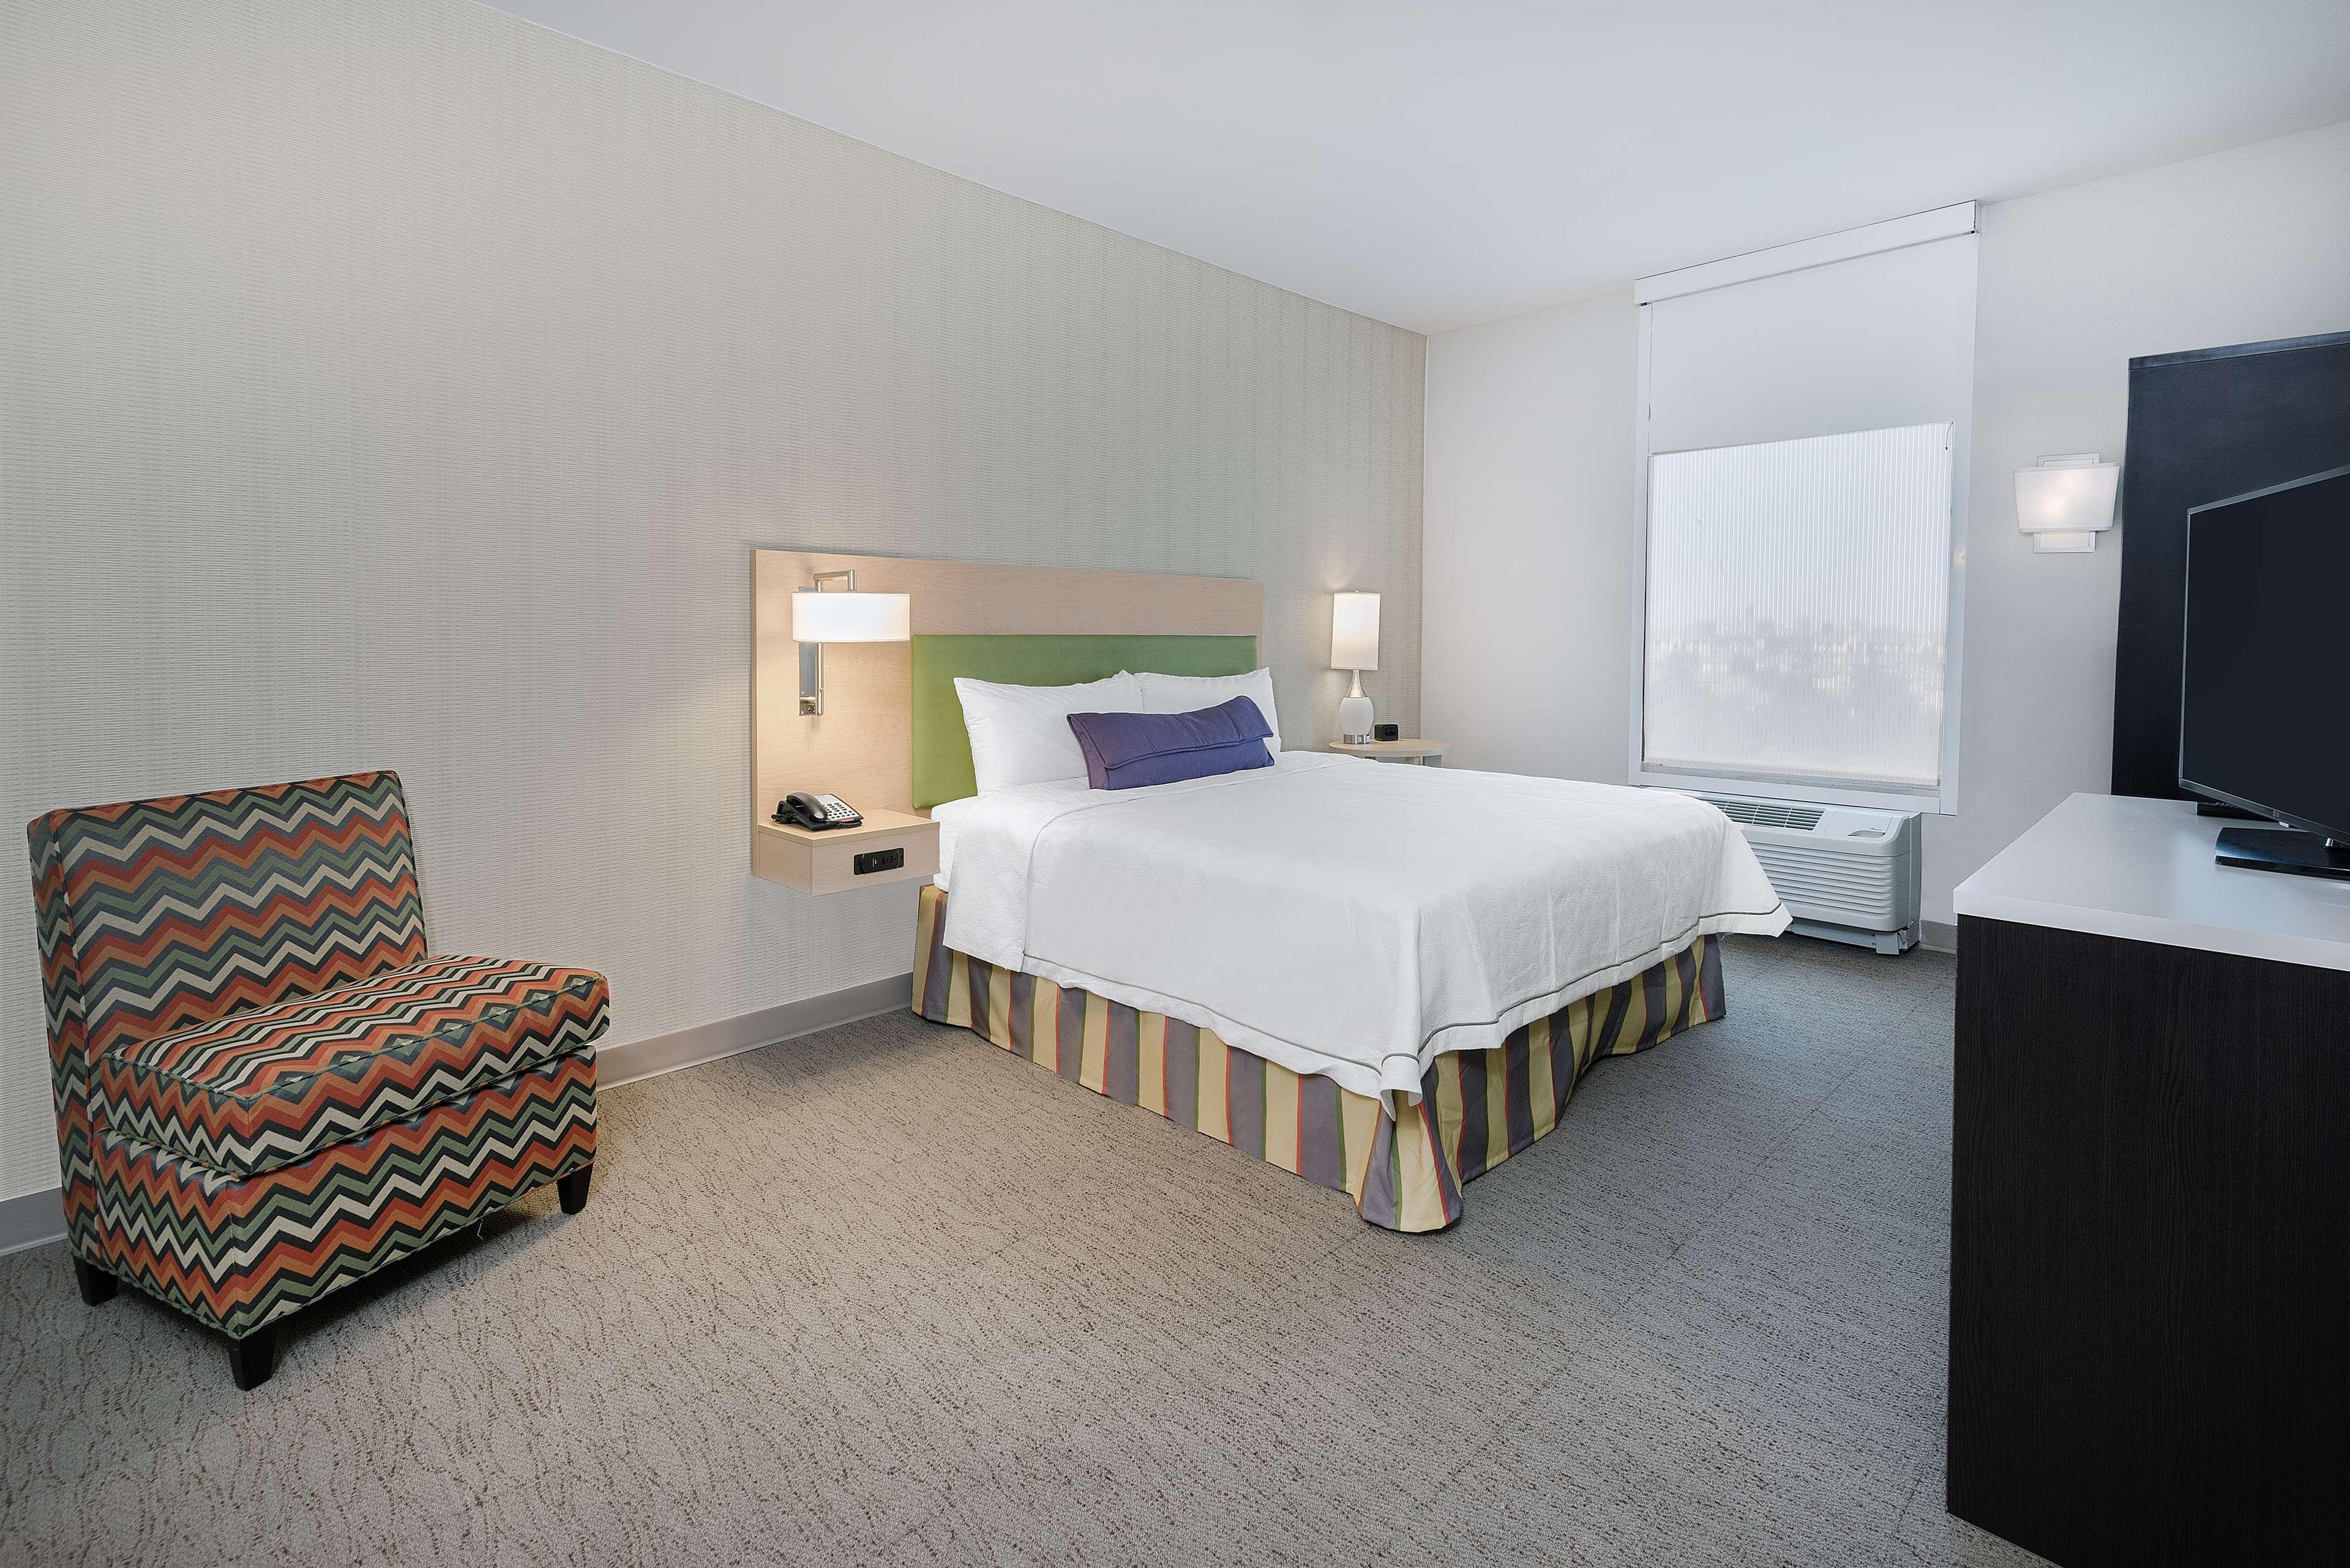 Home2 Suites by Hilton Austin Airport image 32